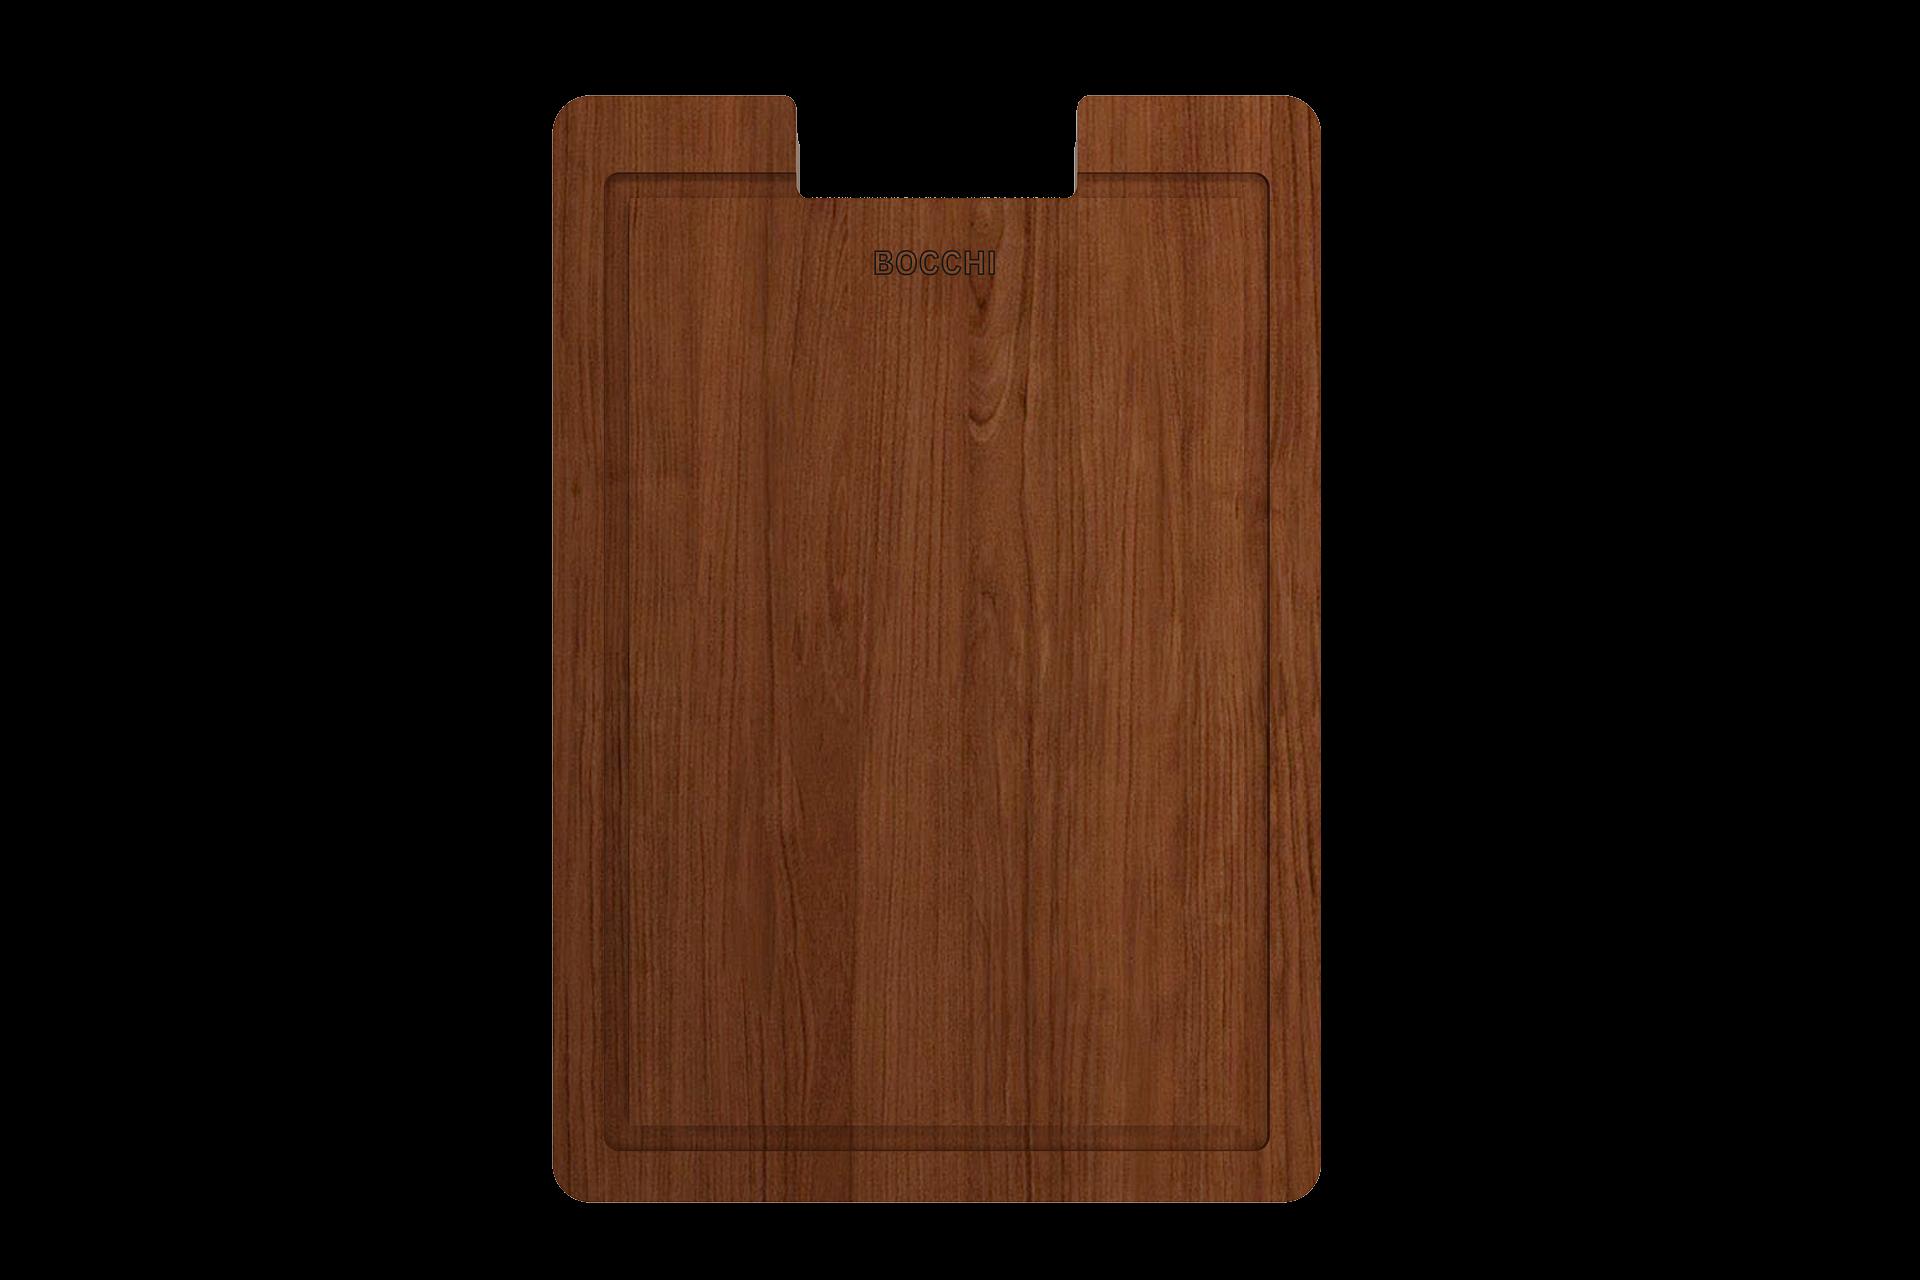 Wooden Cutting Board for BOCCHI STEP RIM fireclay kitchen ...